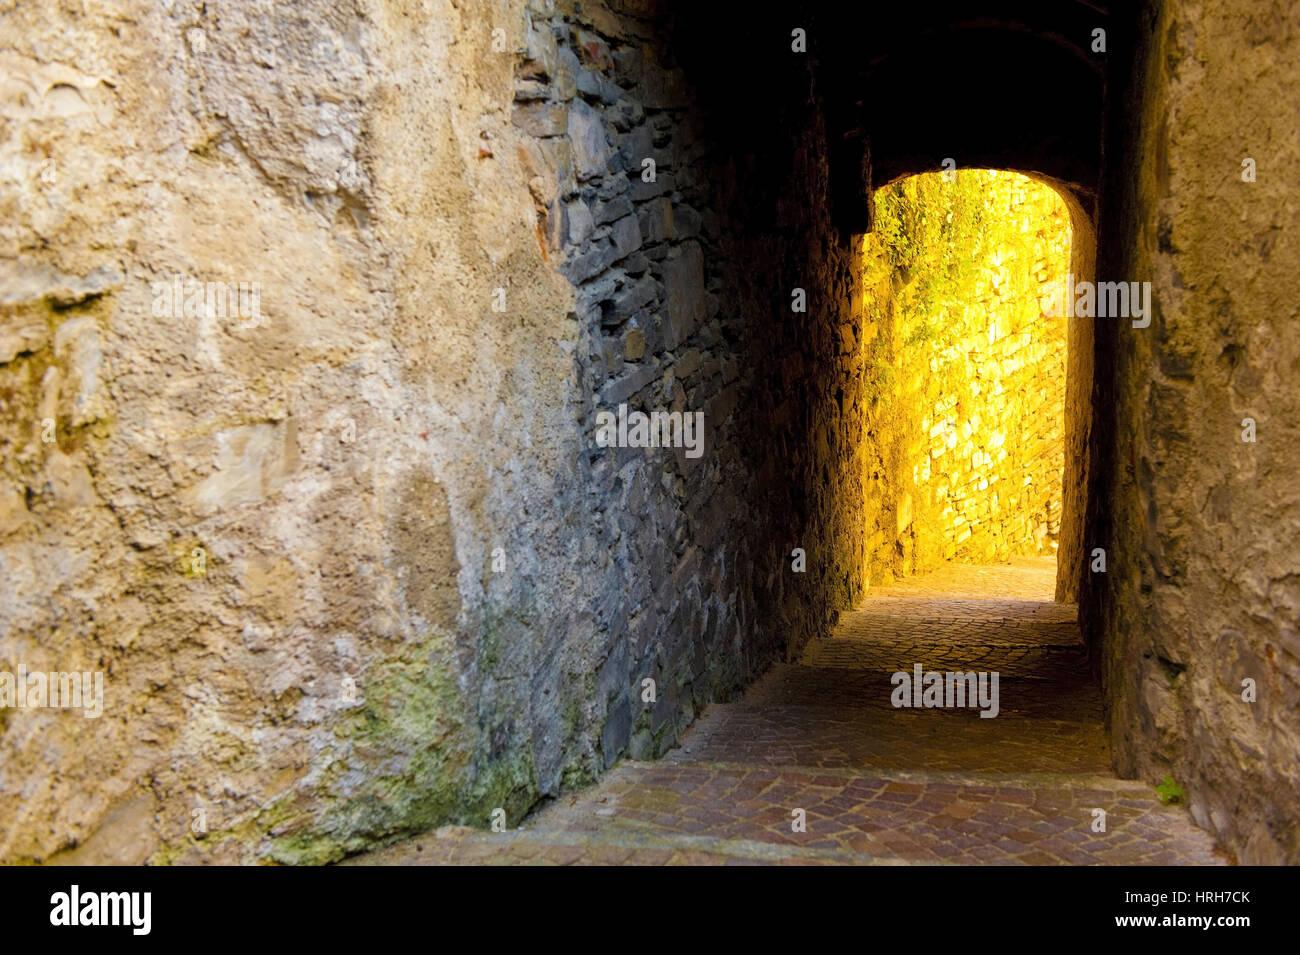 erleuchteter Durchgang, Altstadt in Torno, Italien - illuminated alleyway, Old Town in Torno, Italy Stock Photo